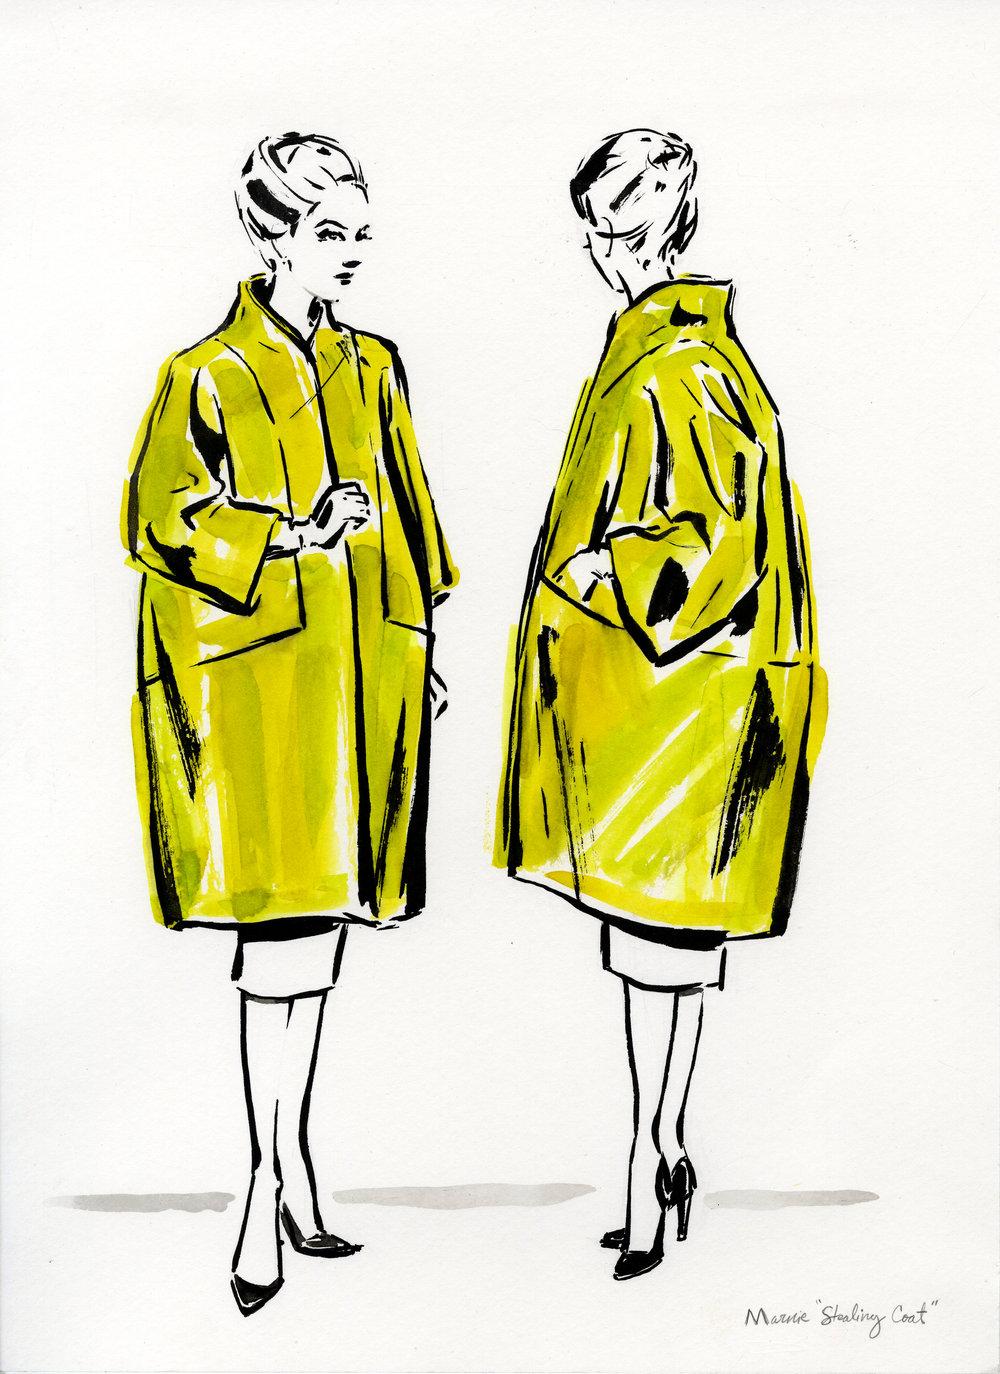 Marnie_Stealing Coat_Nicoe Guice.jpg